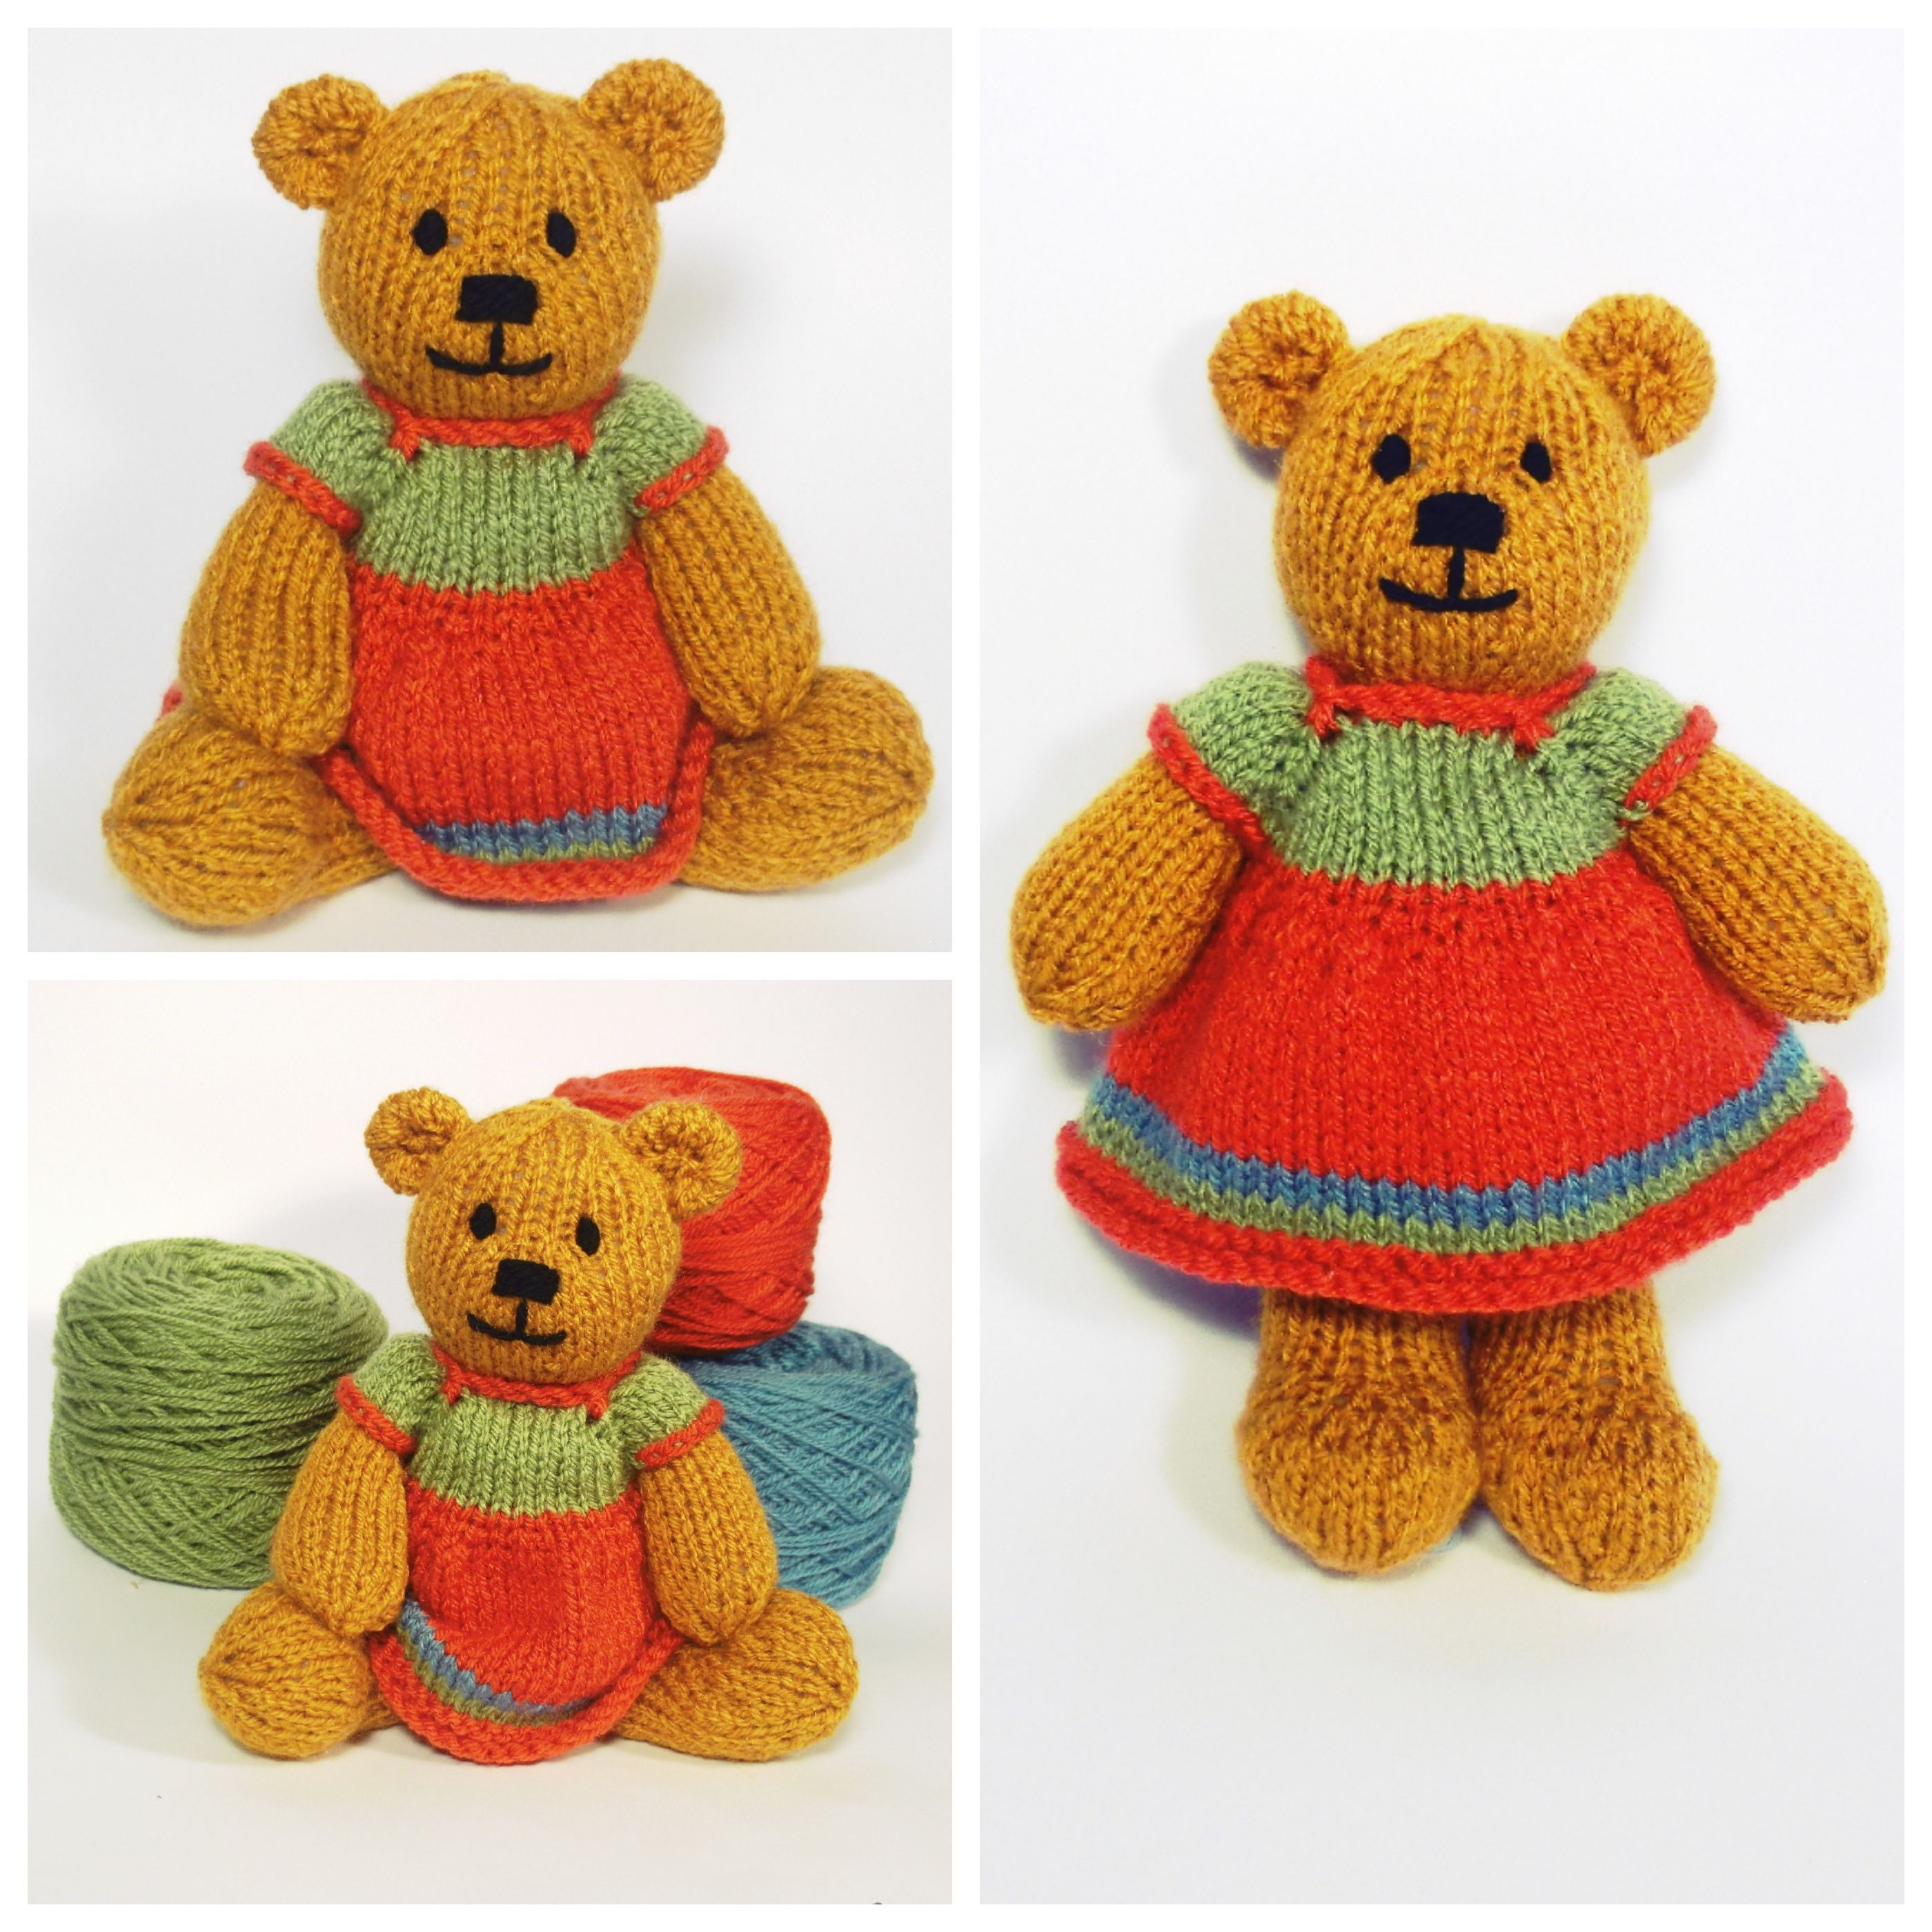 Girl Teddy Bear , Knitting Pattern | Teddy bear knitting ...